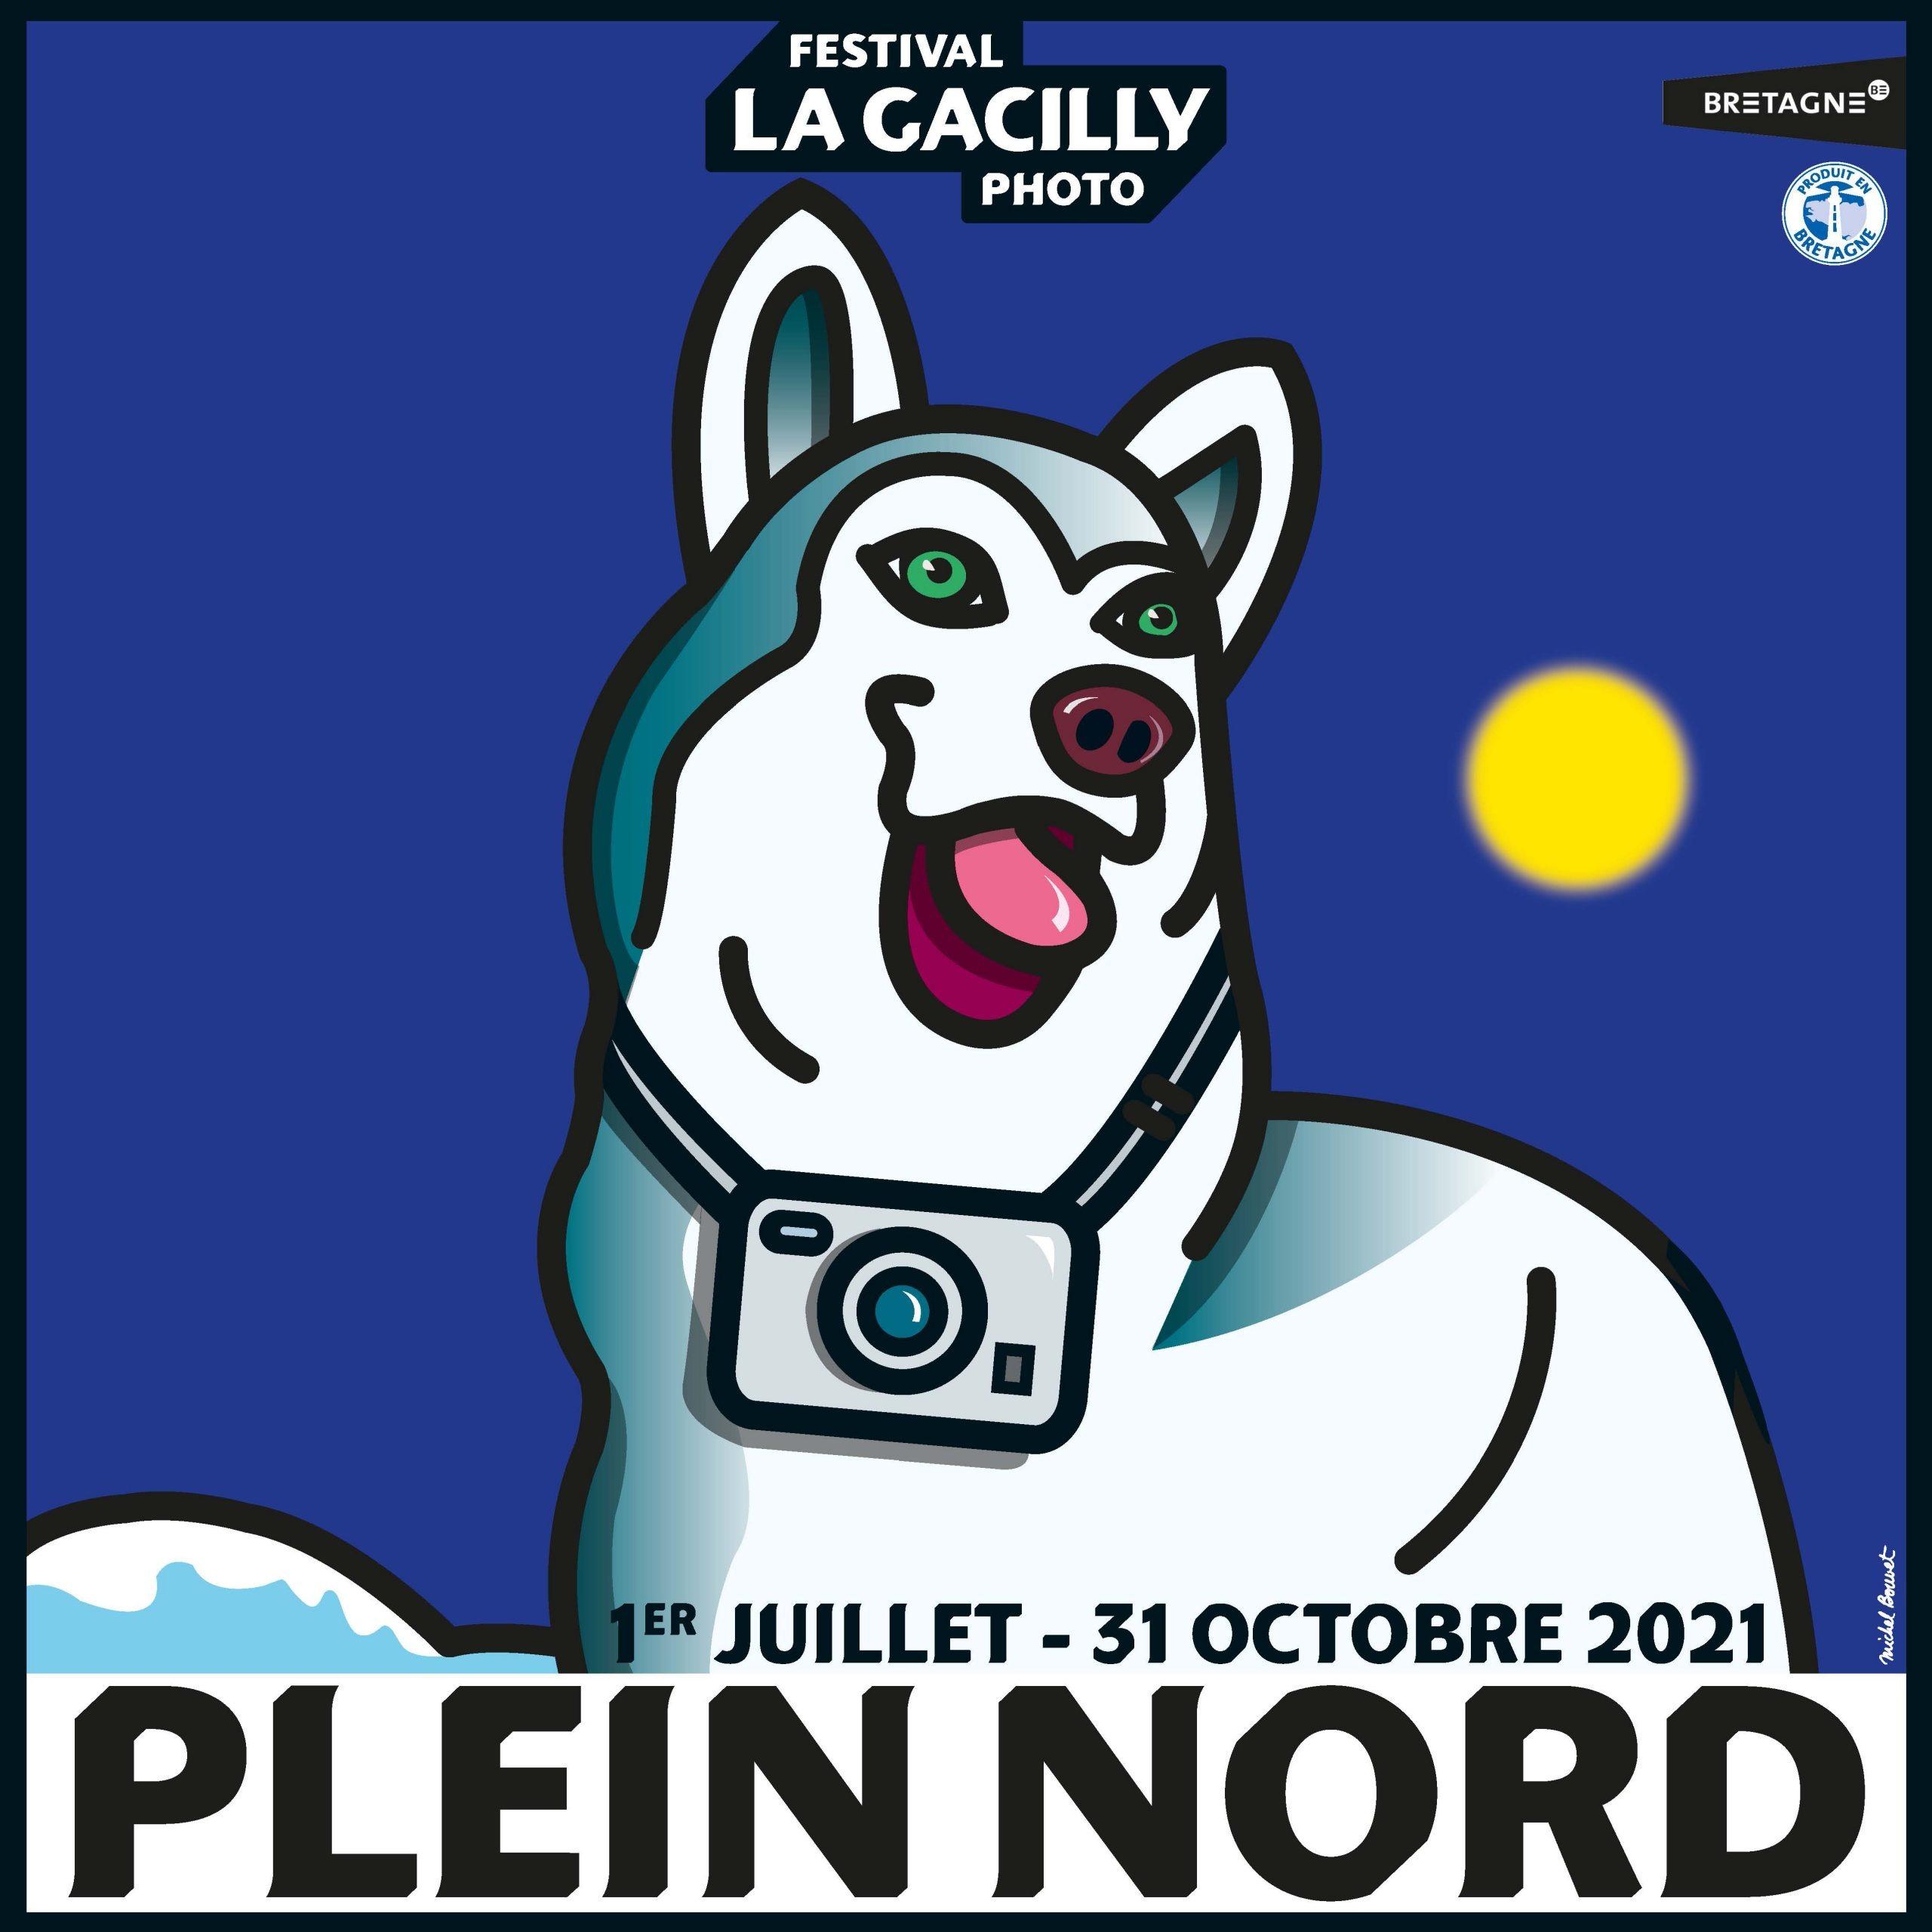 Festival Photo La Gacilly